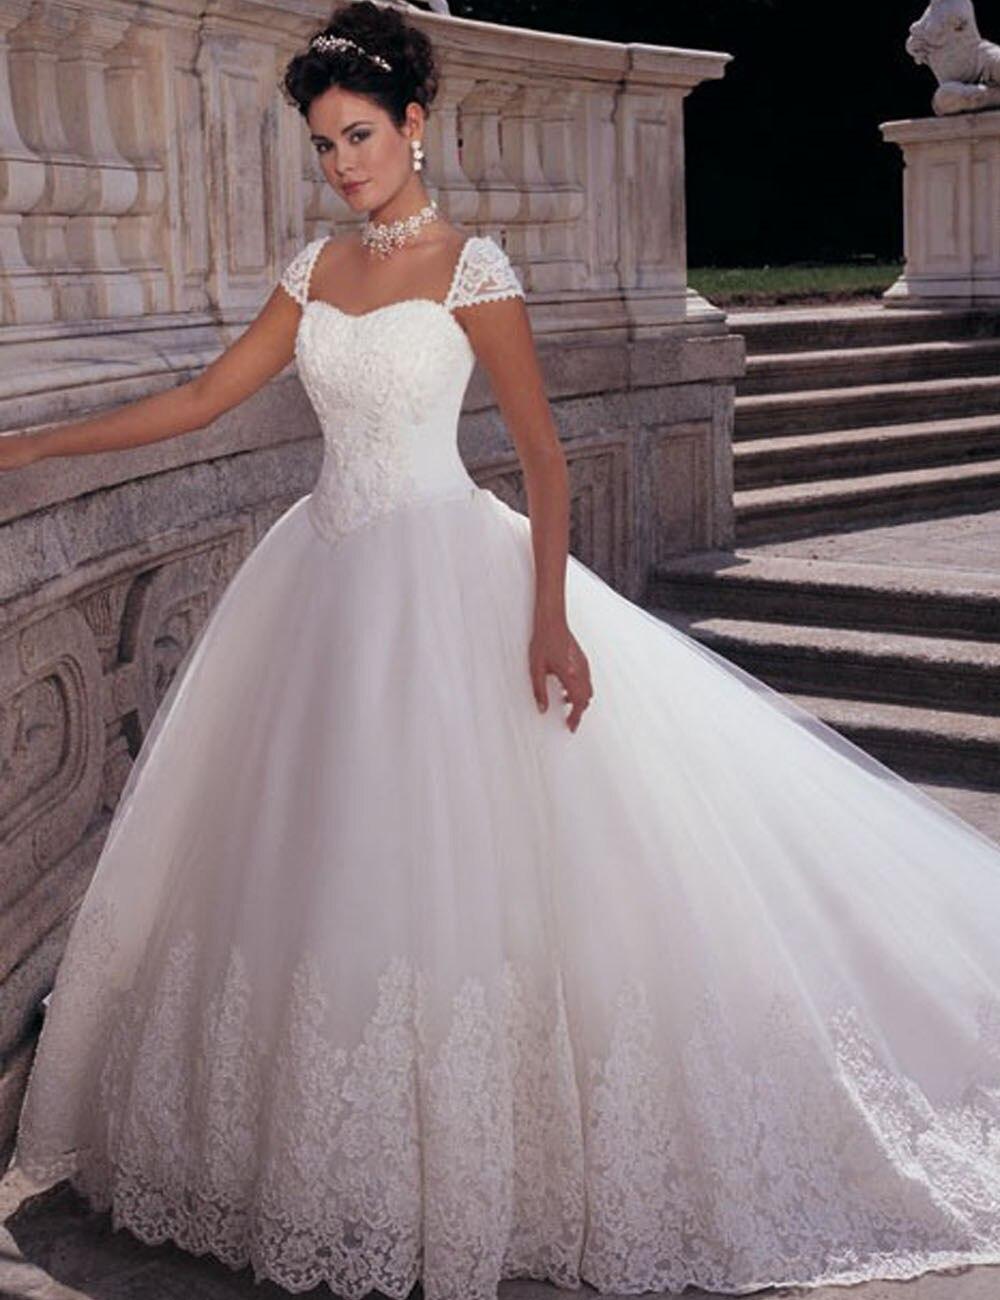 Fairytale Princess Wedding Dresses Vernassa Cap Sleeve Beaded Appliqued Lace Puffy vestido de noiva casamento robe de mariage